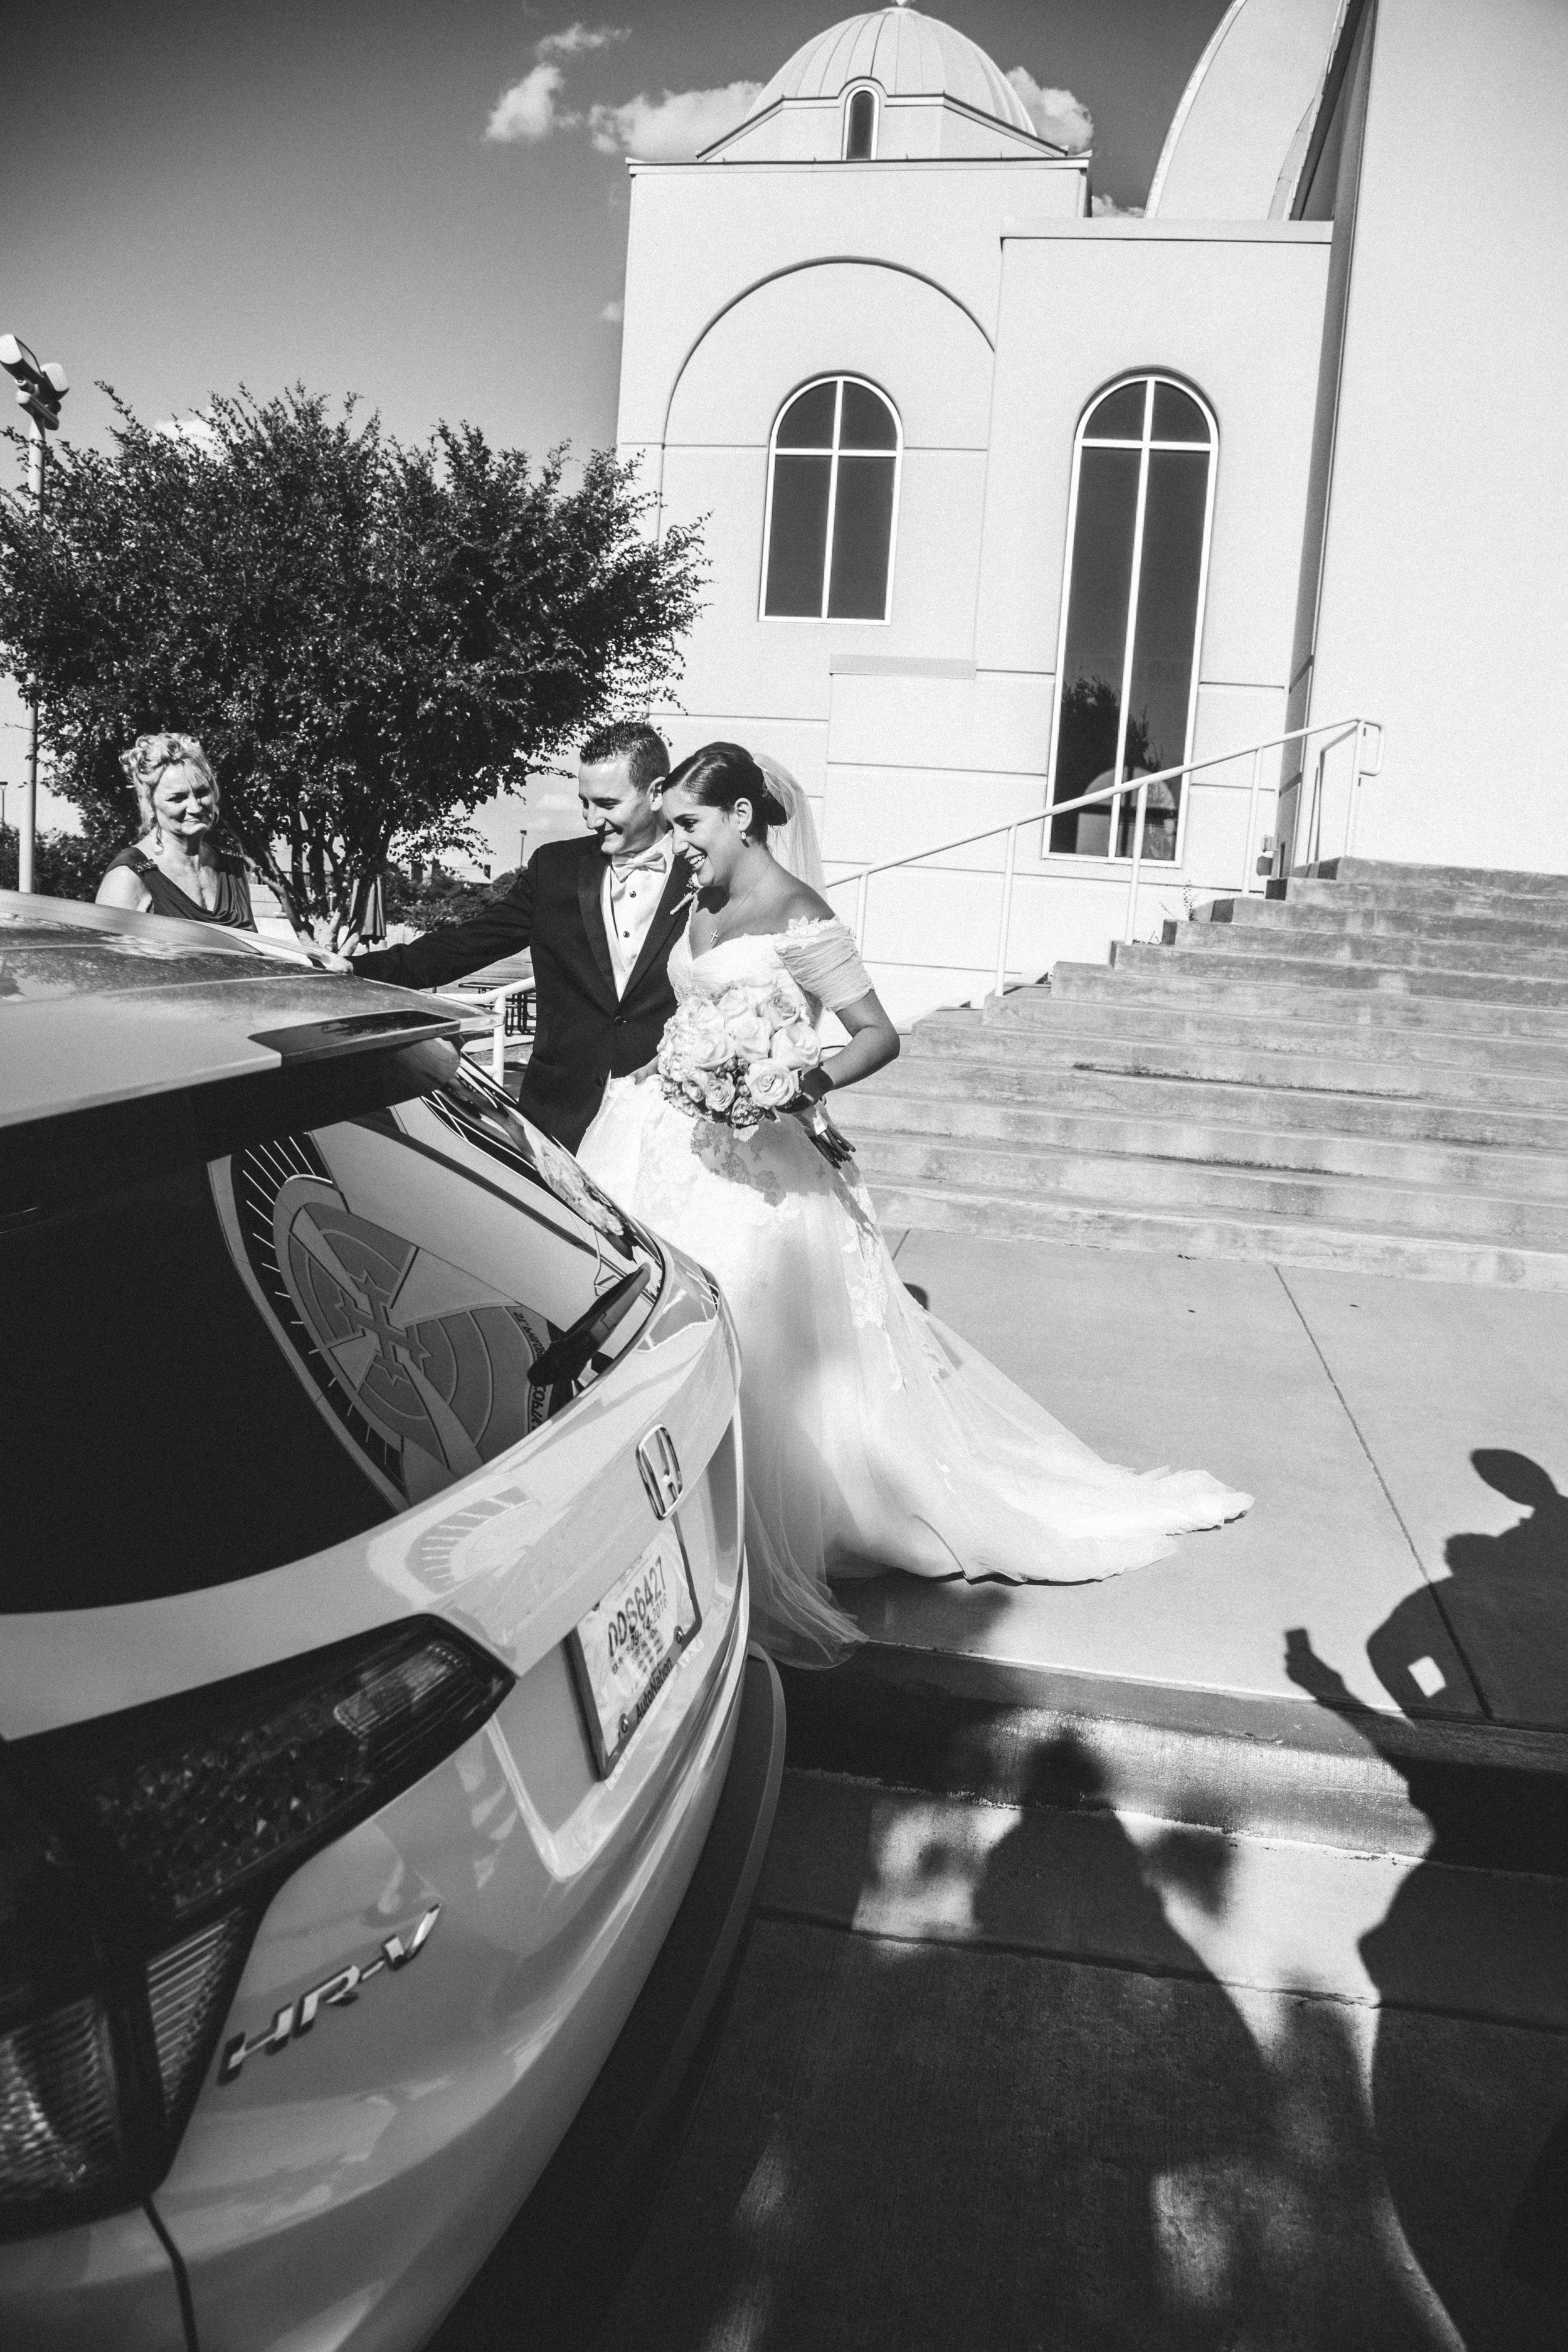 ATGI_Magali & Josh Wedding_2S8A1092.jpg